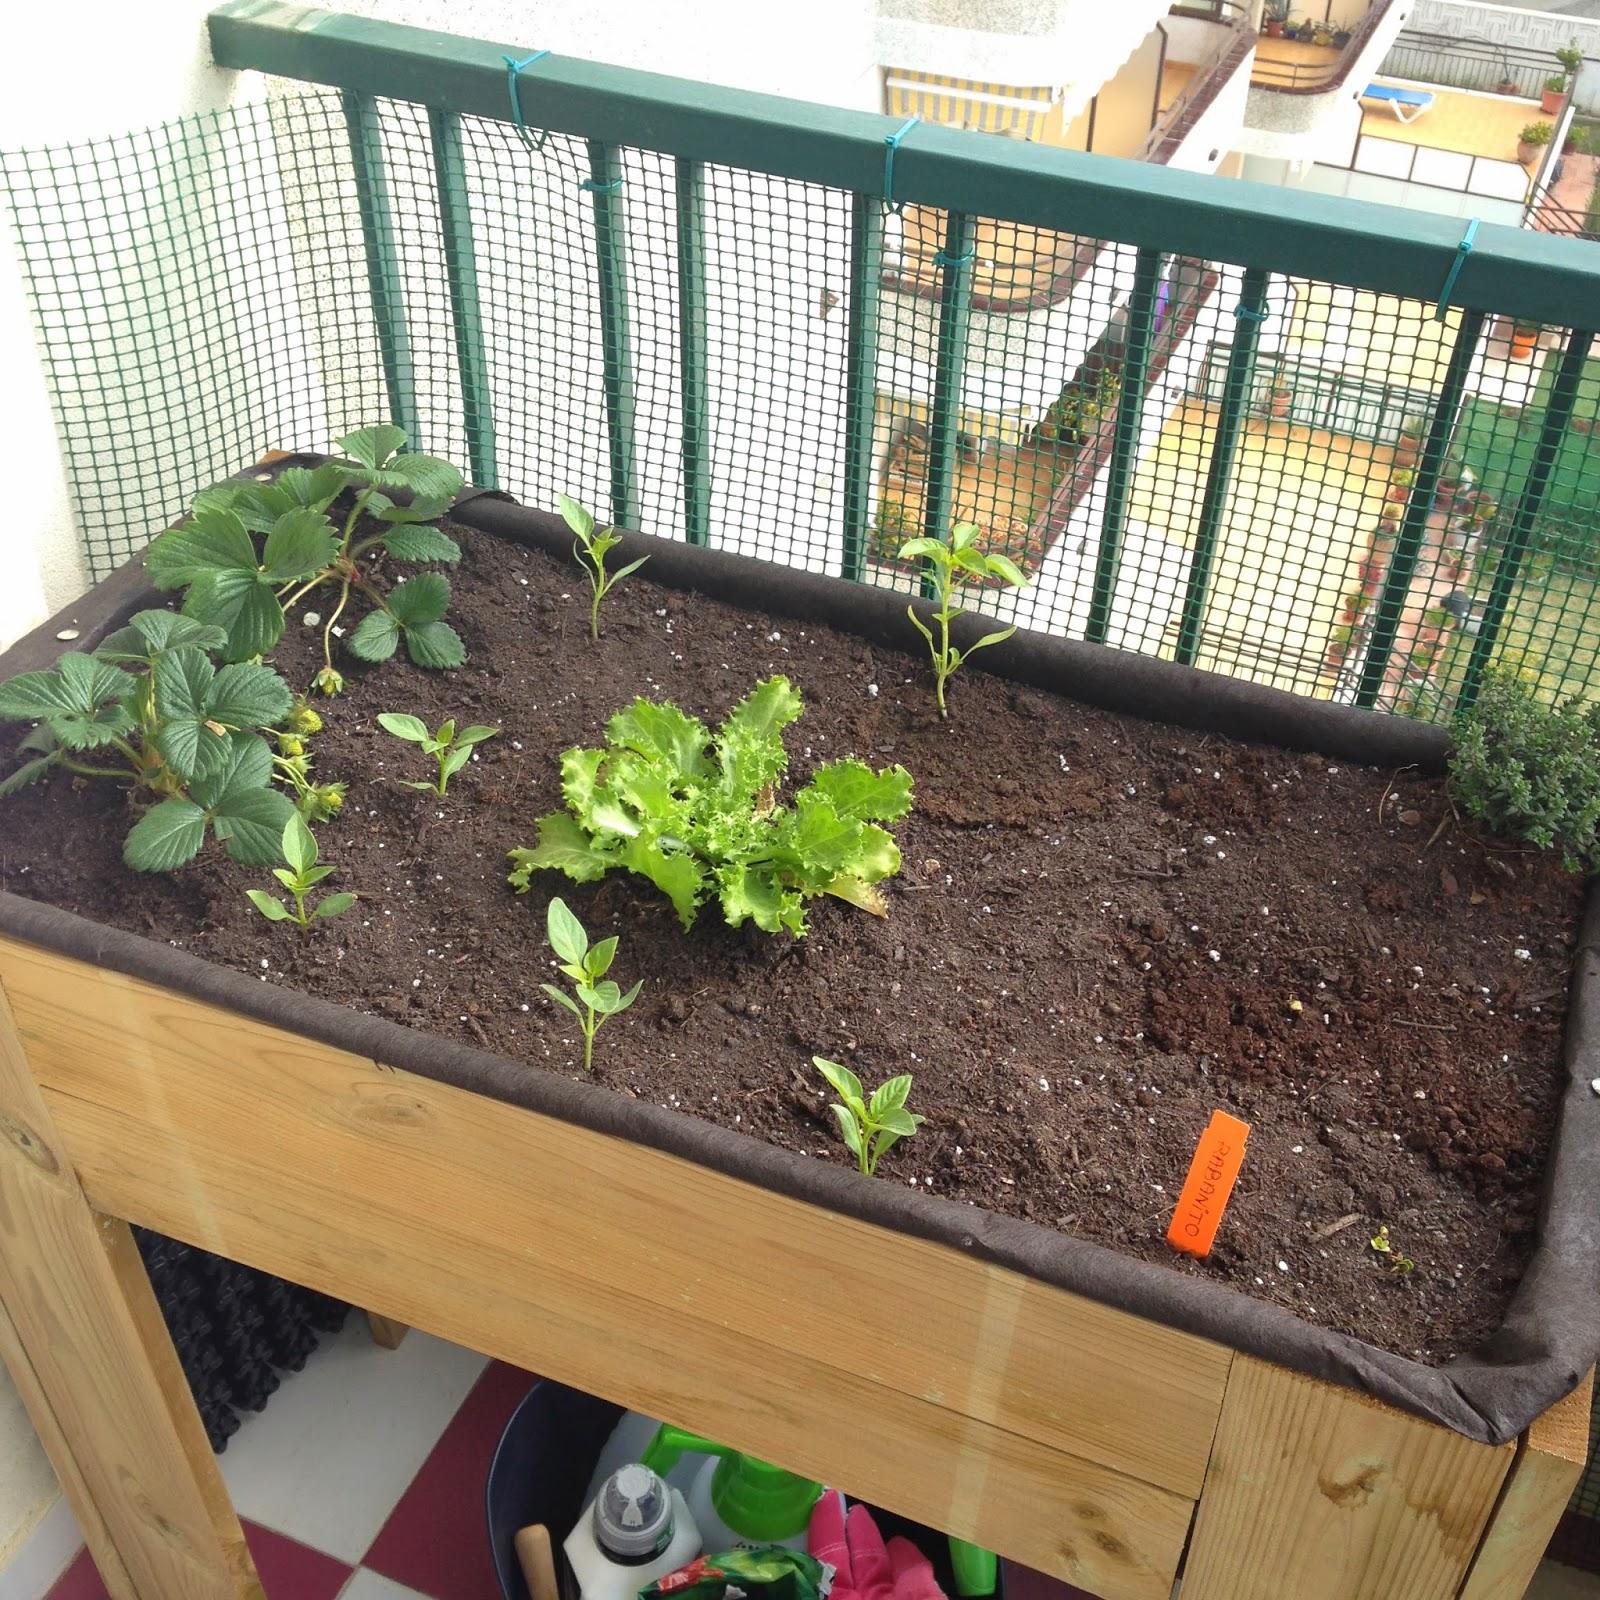 La mesa de cultivo tomates urbanitas - Drenaje mesa de cultivo ...